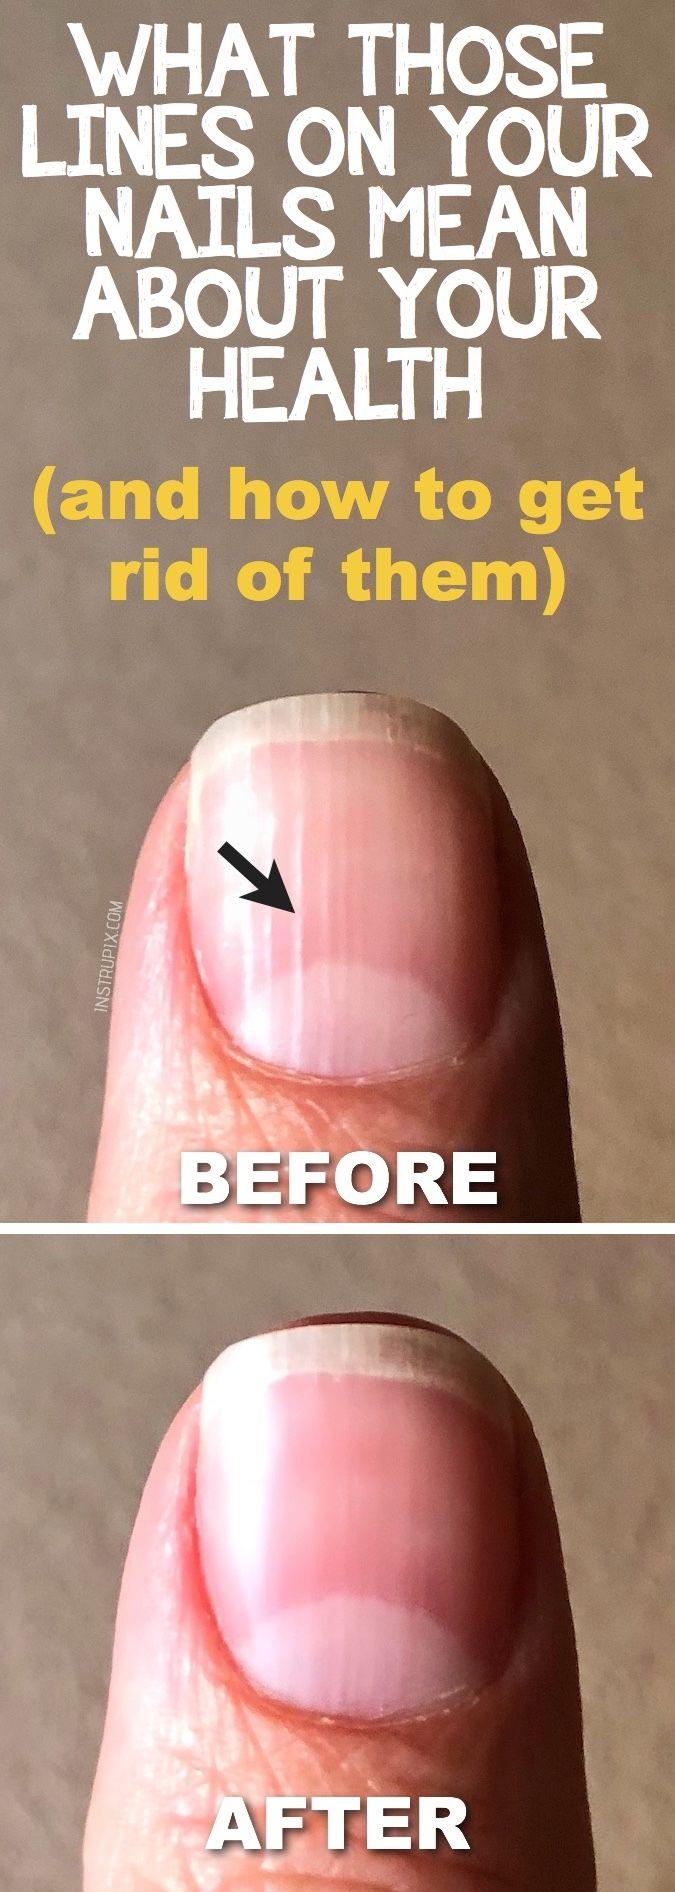 what do ridges in your toenails mean